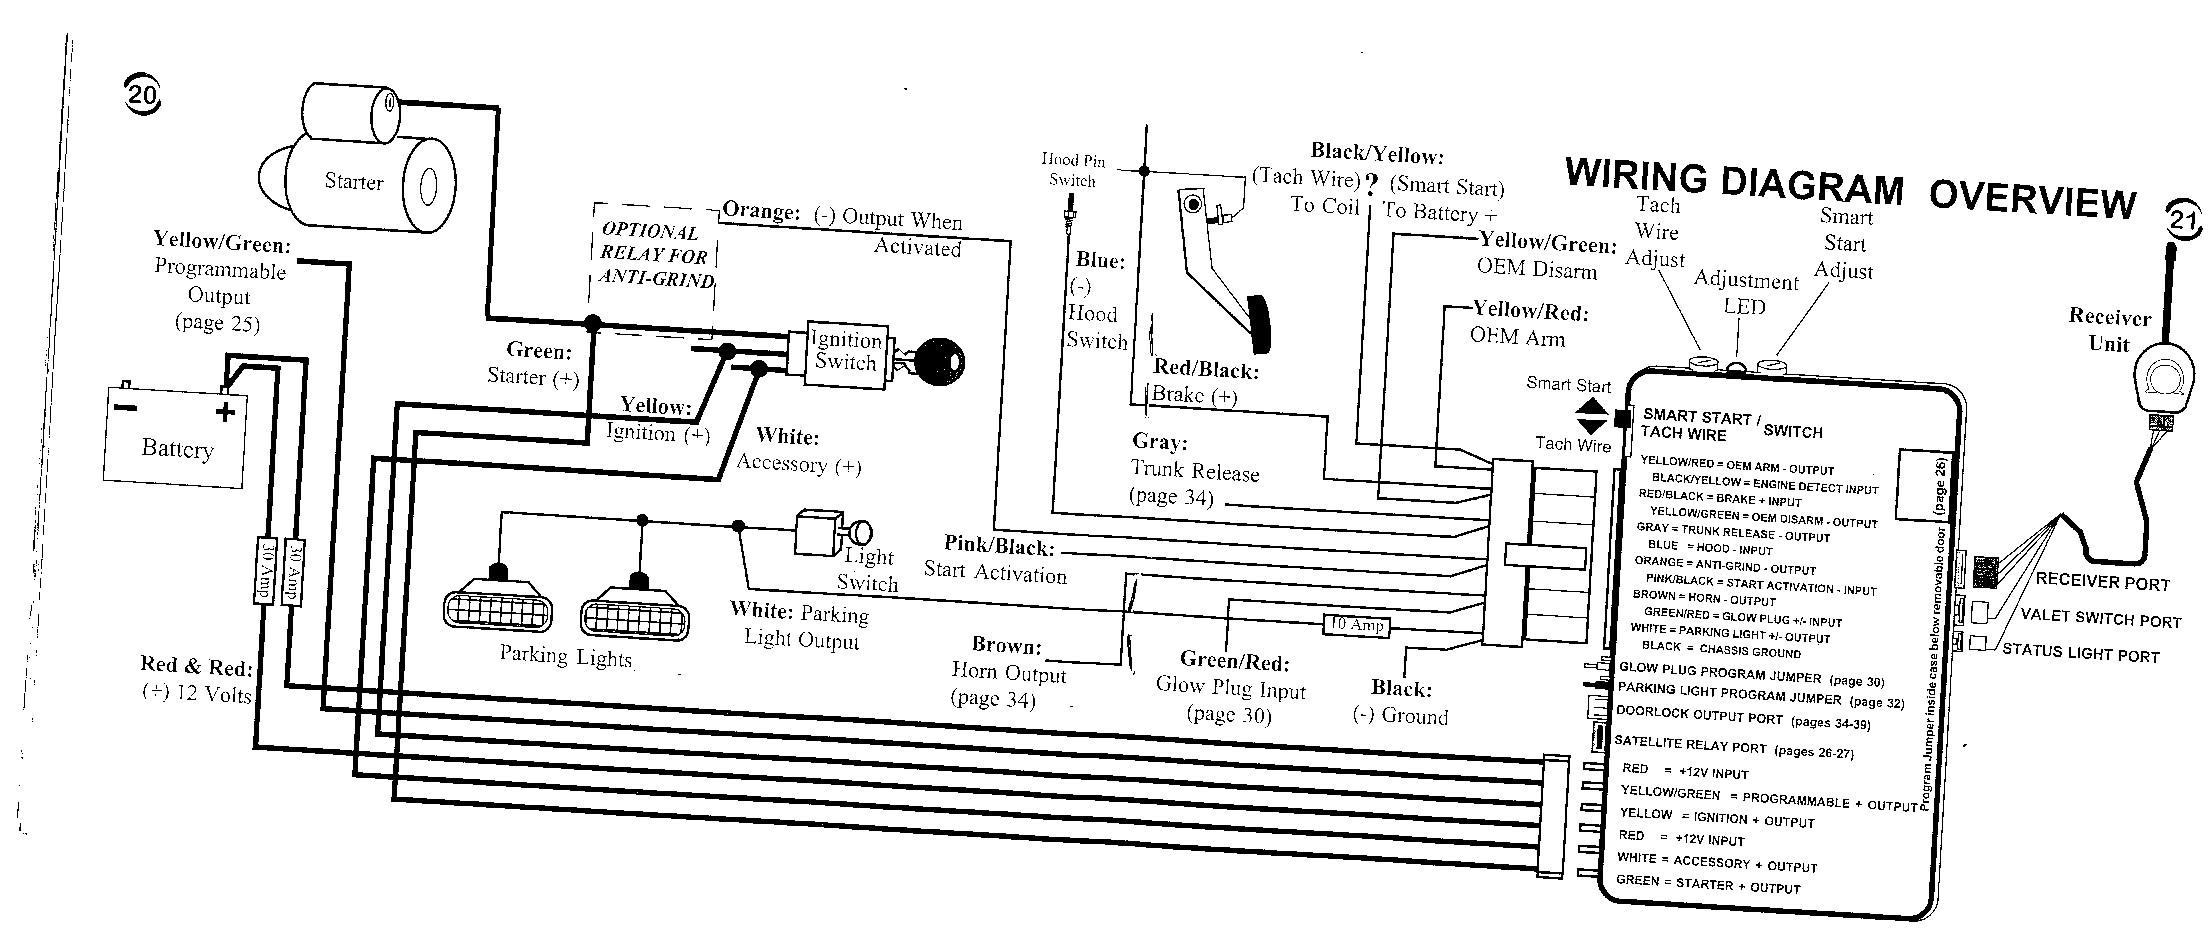 Diagram for Car Mobilizer Viper Car Alarm Wiring Diagram Further Viper Alarm with Remote Start Of Diagram for Car Mobilizer